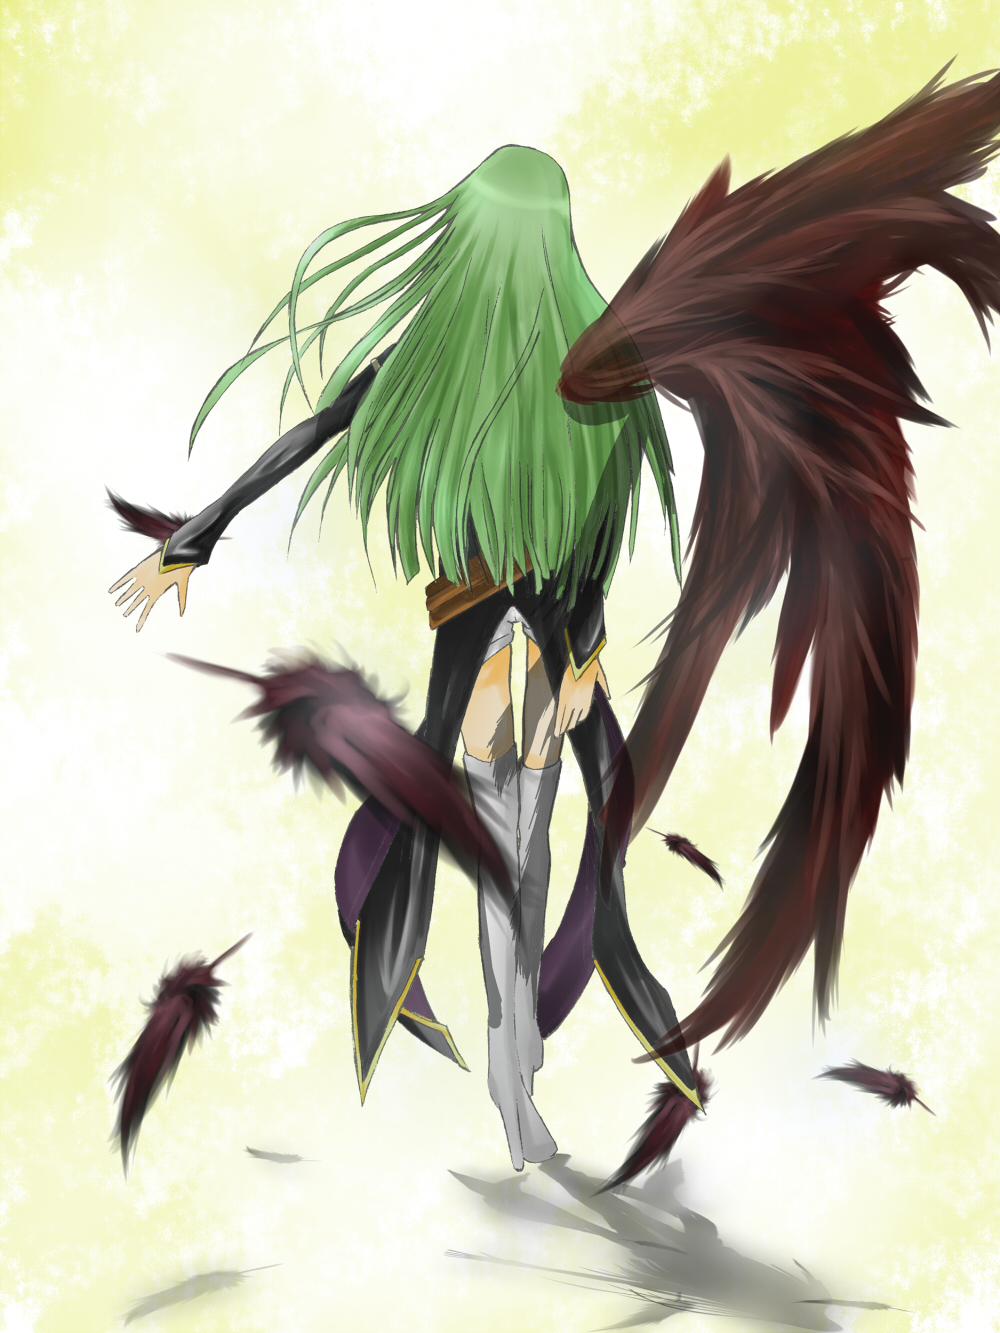 Astrée Koda - I'm gonna be your little green angel 13972620100427272066